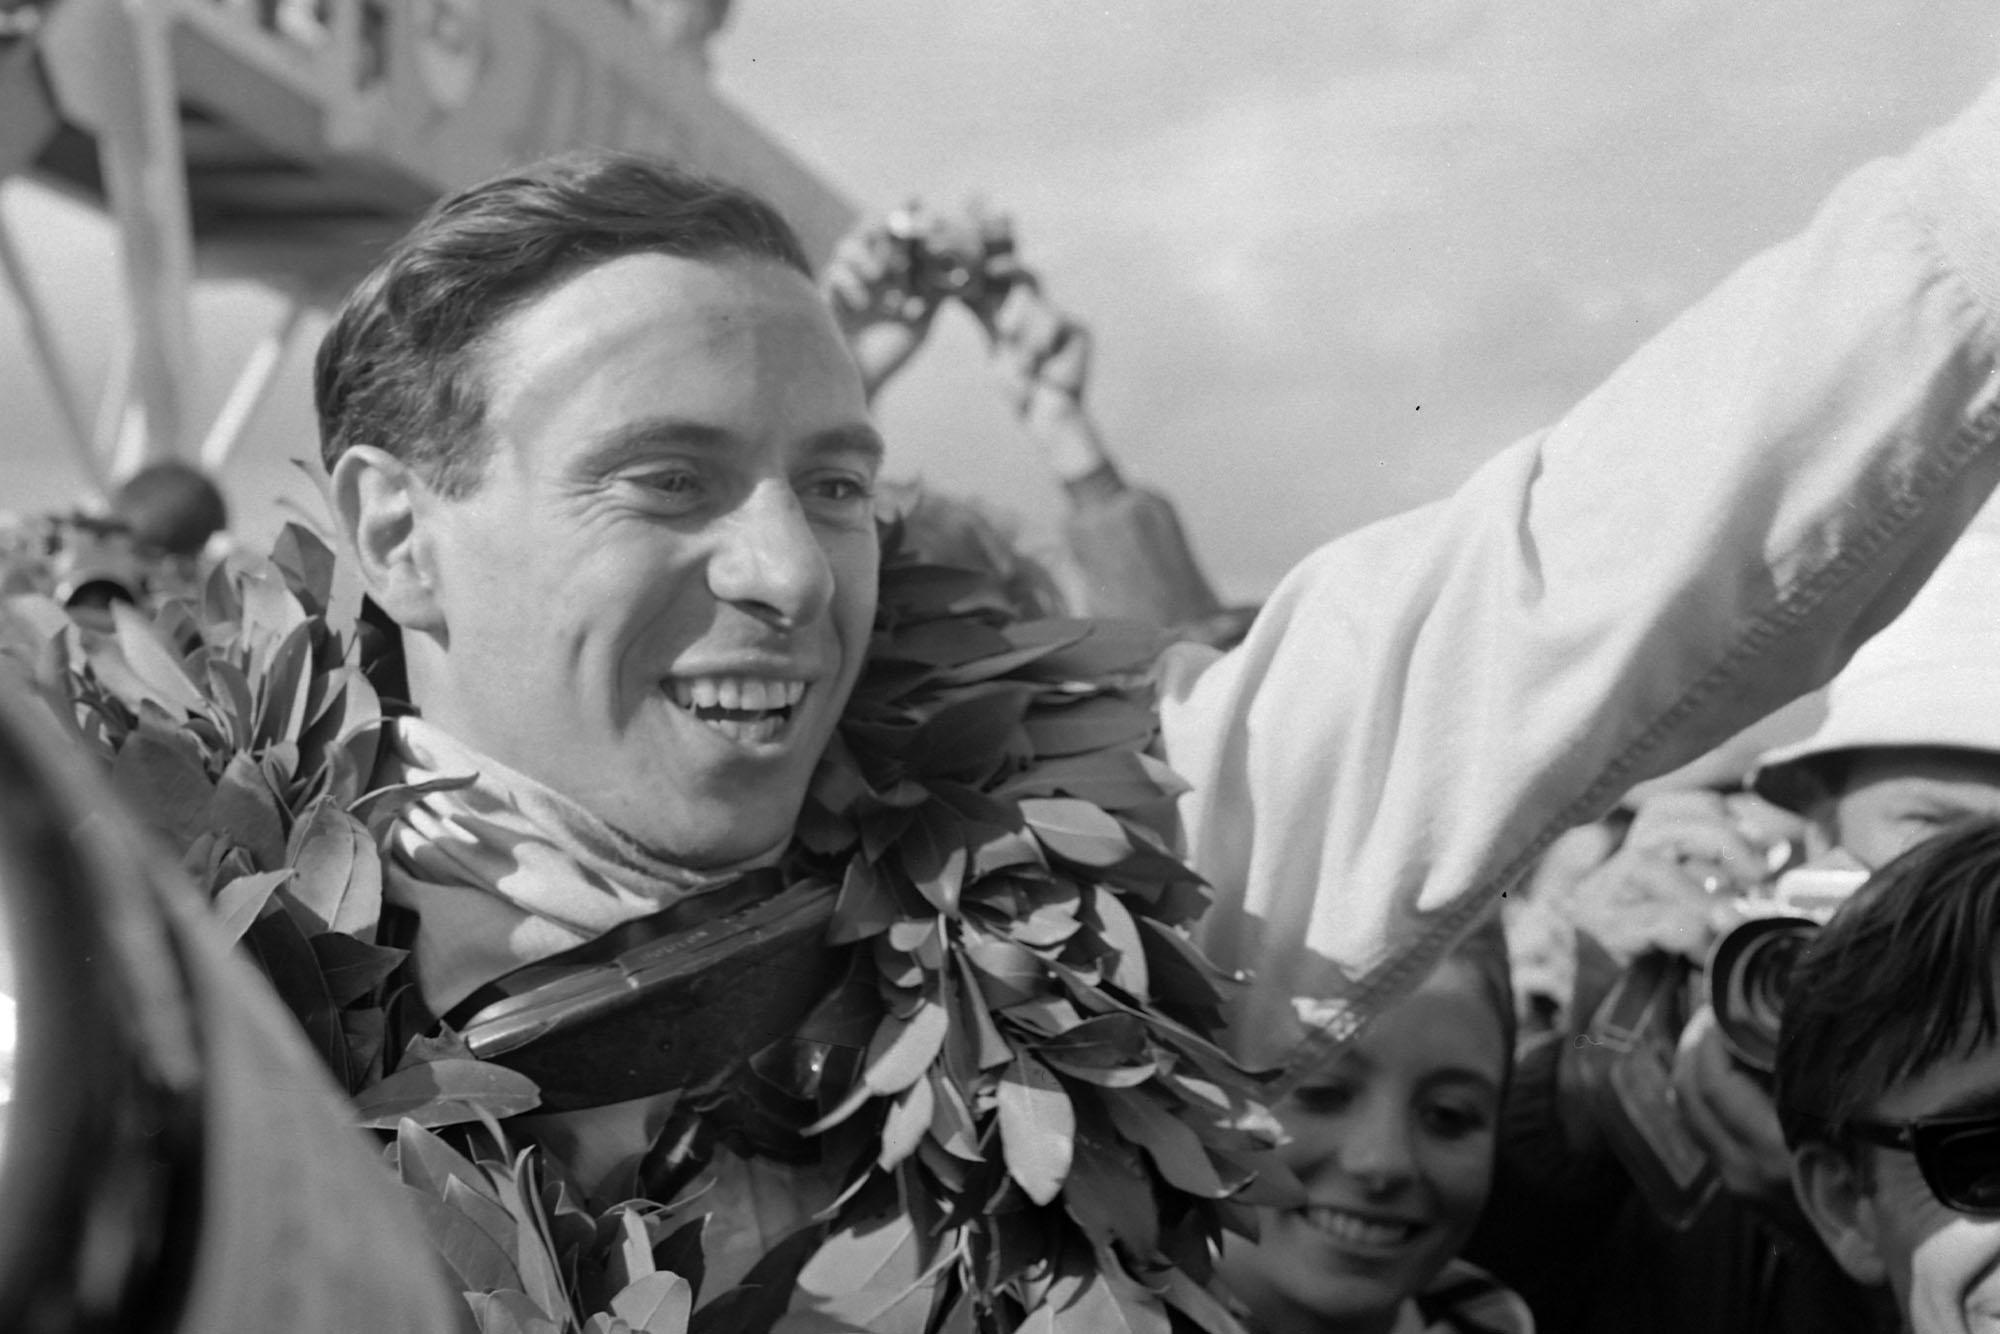 Race winner Jim Clark celebrates victory in the pit lane.